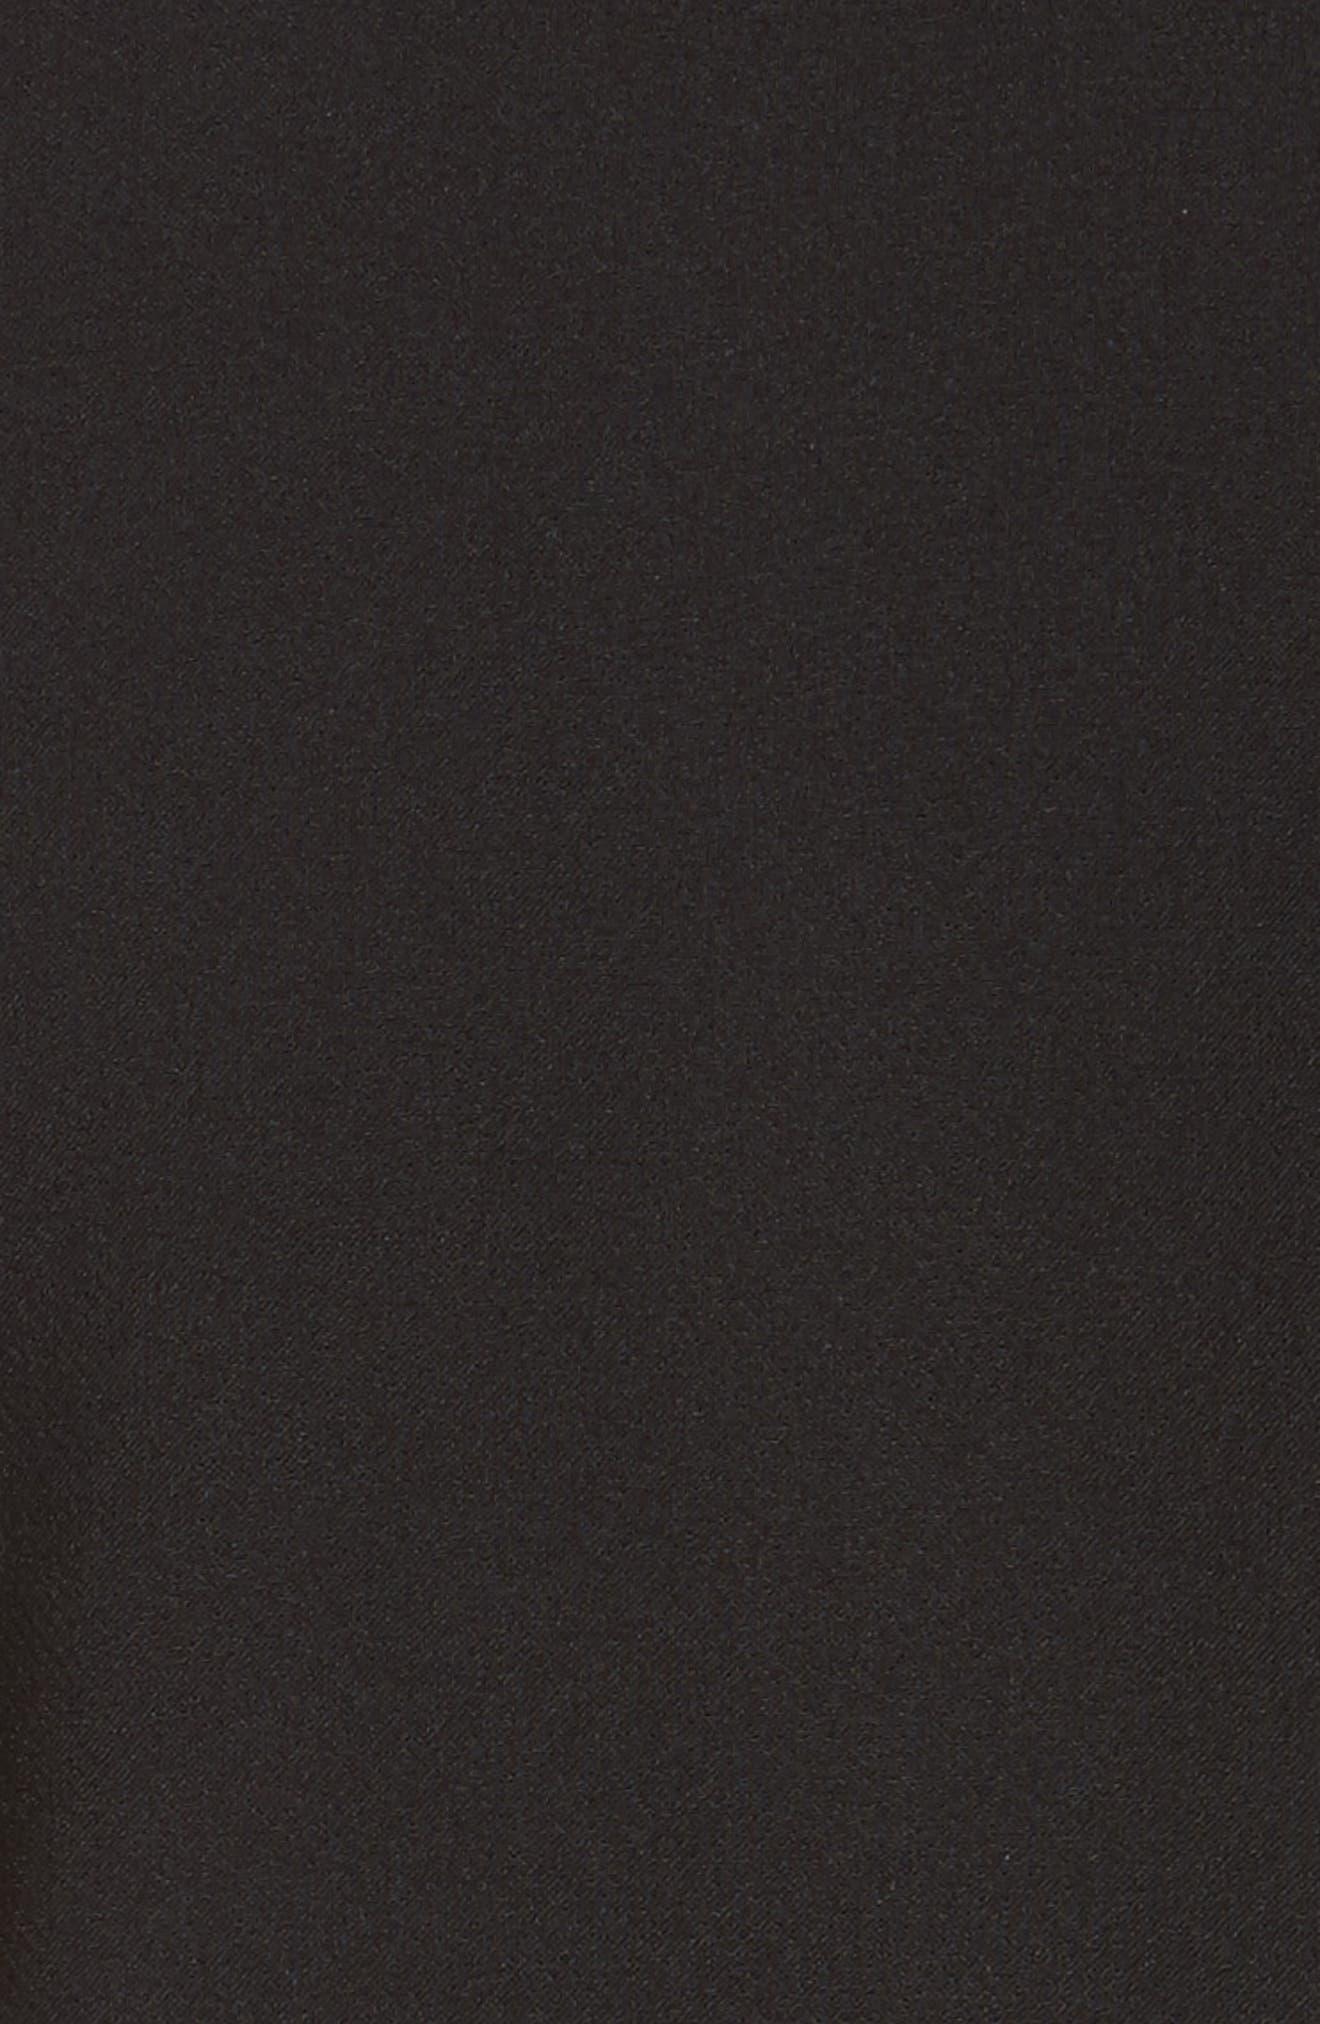 Sabine Stretch Cady Sheath Dress,                             Alternate thumbnail 5, color,                             Black